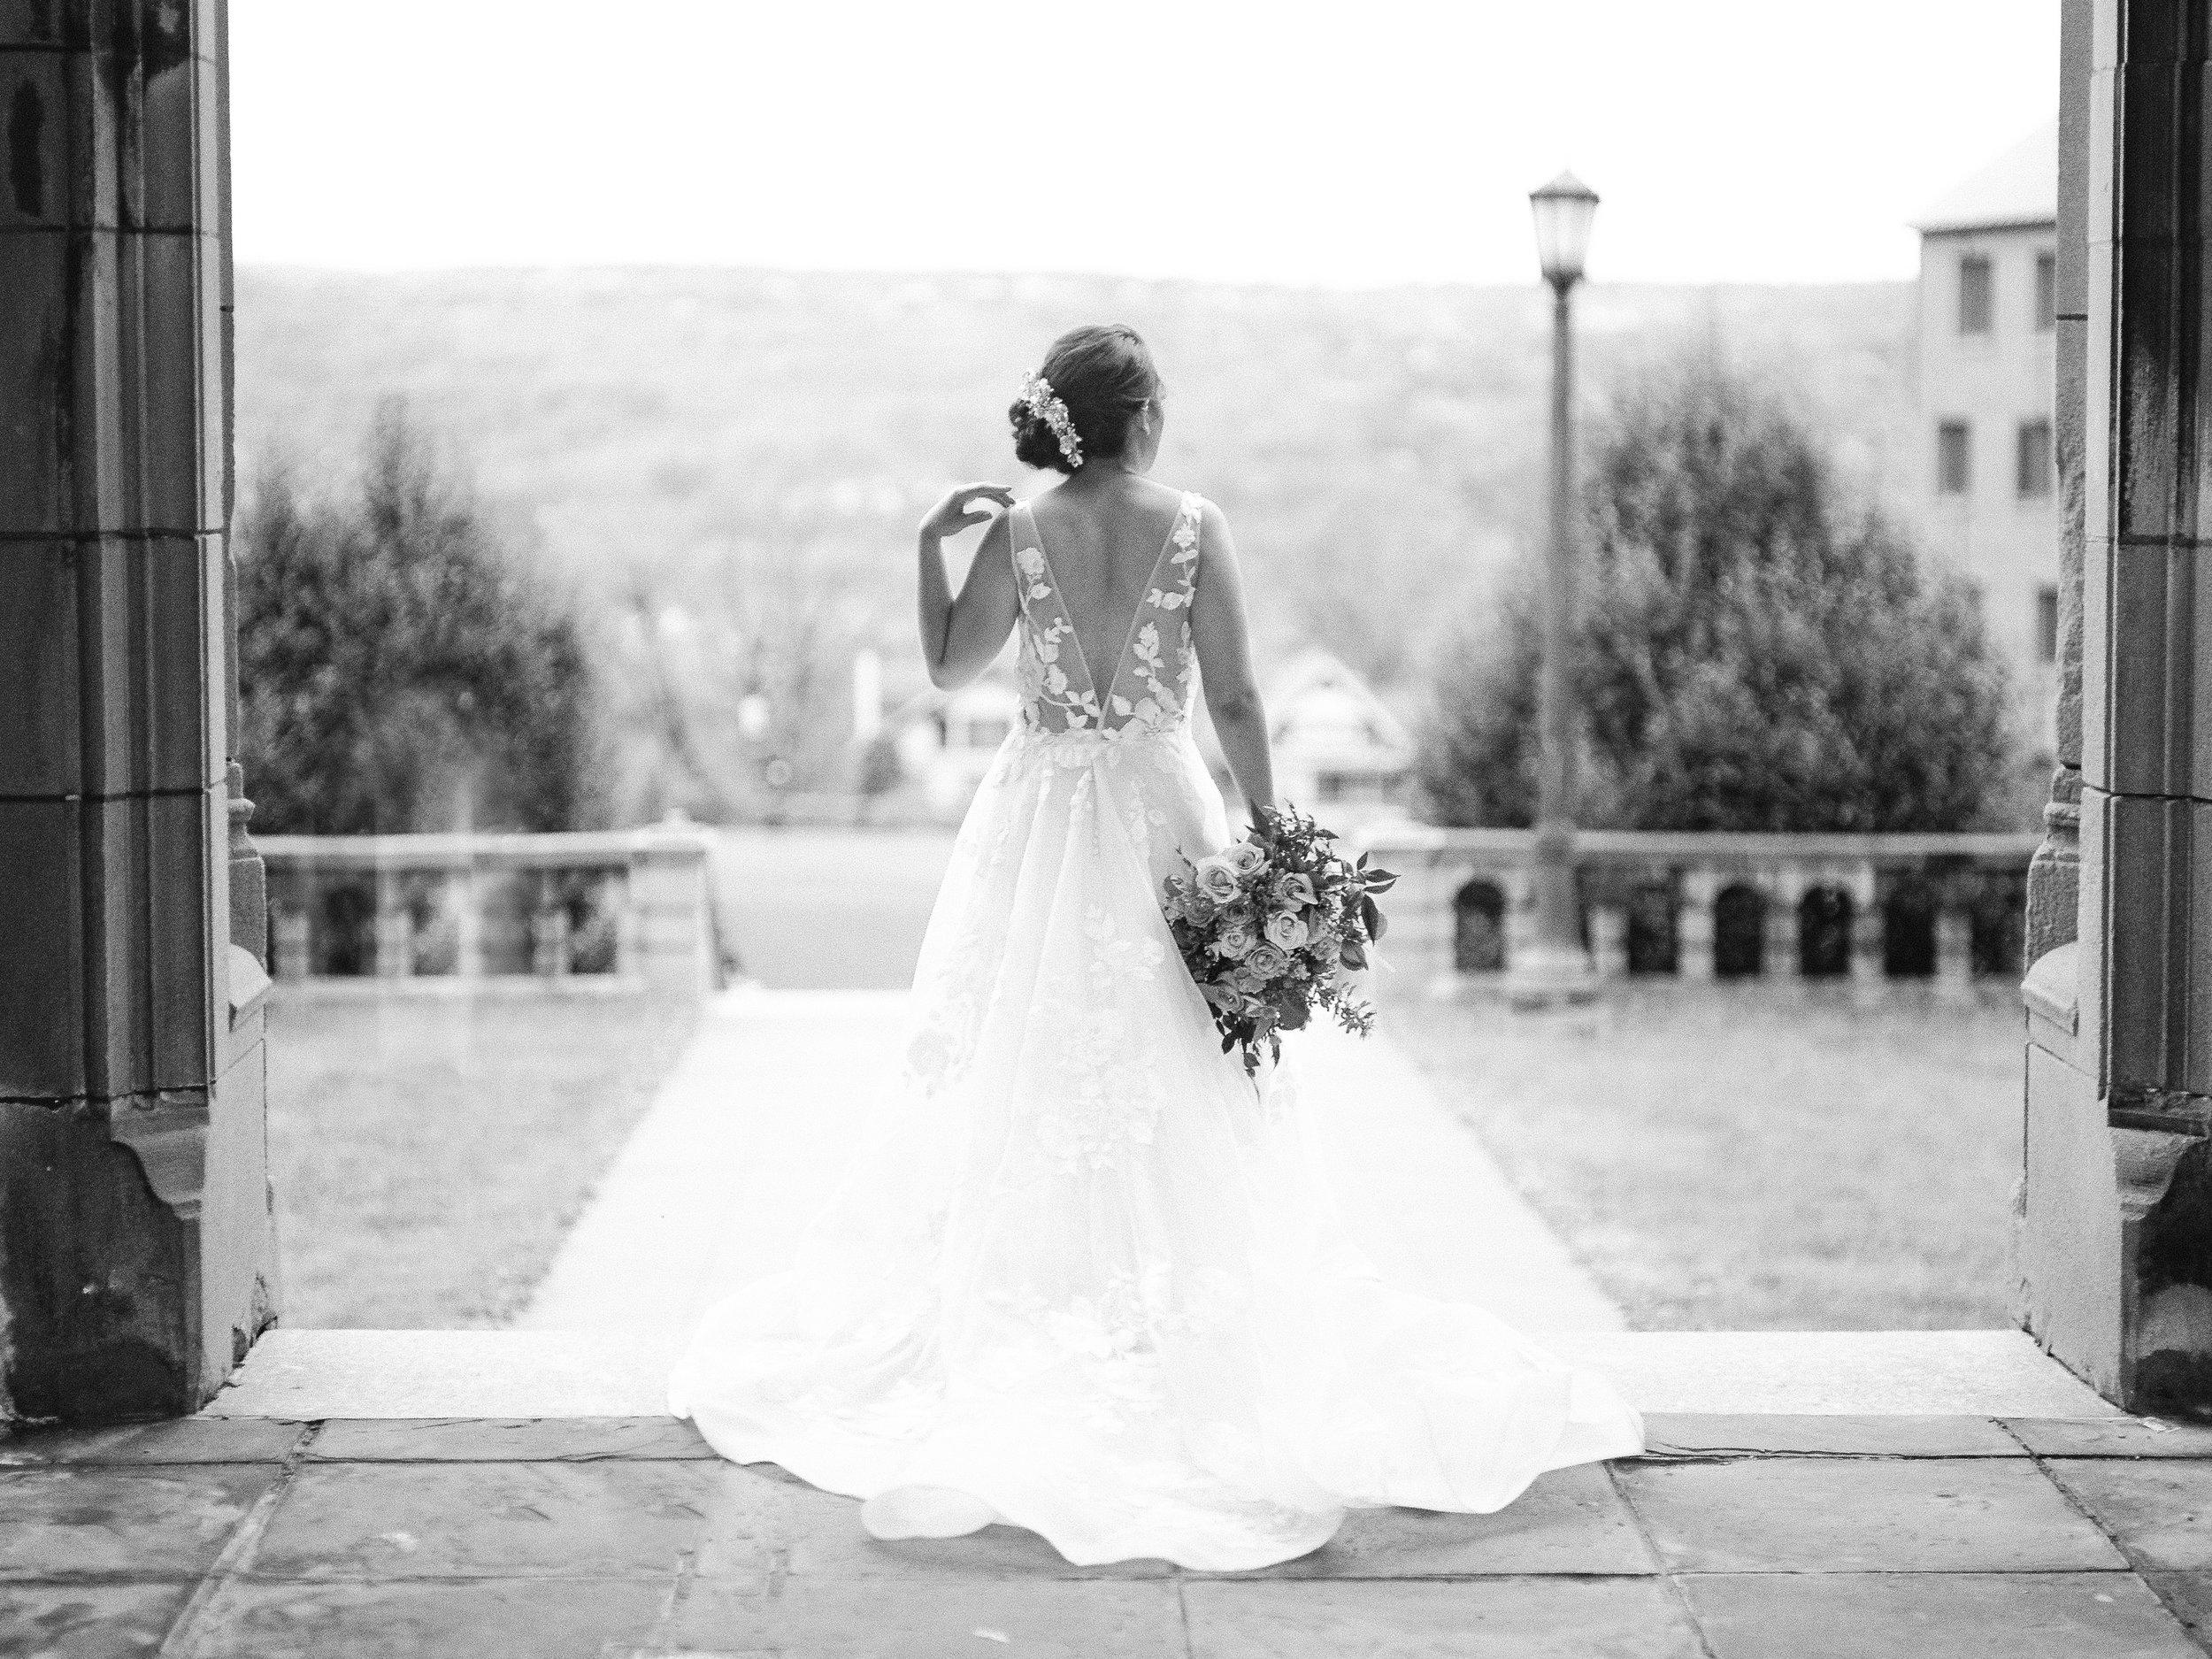 Ithaca New York-Brides Story-Manda Weaver-Wedding-64.jpg